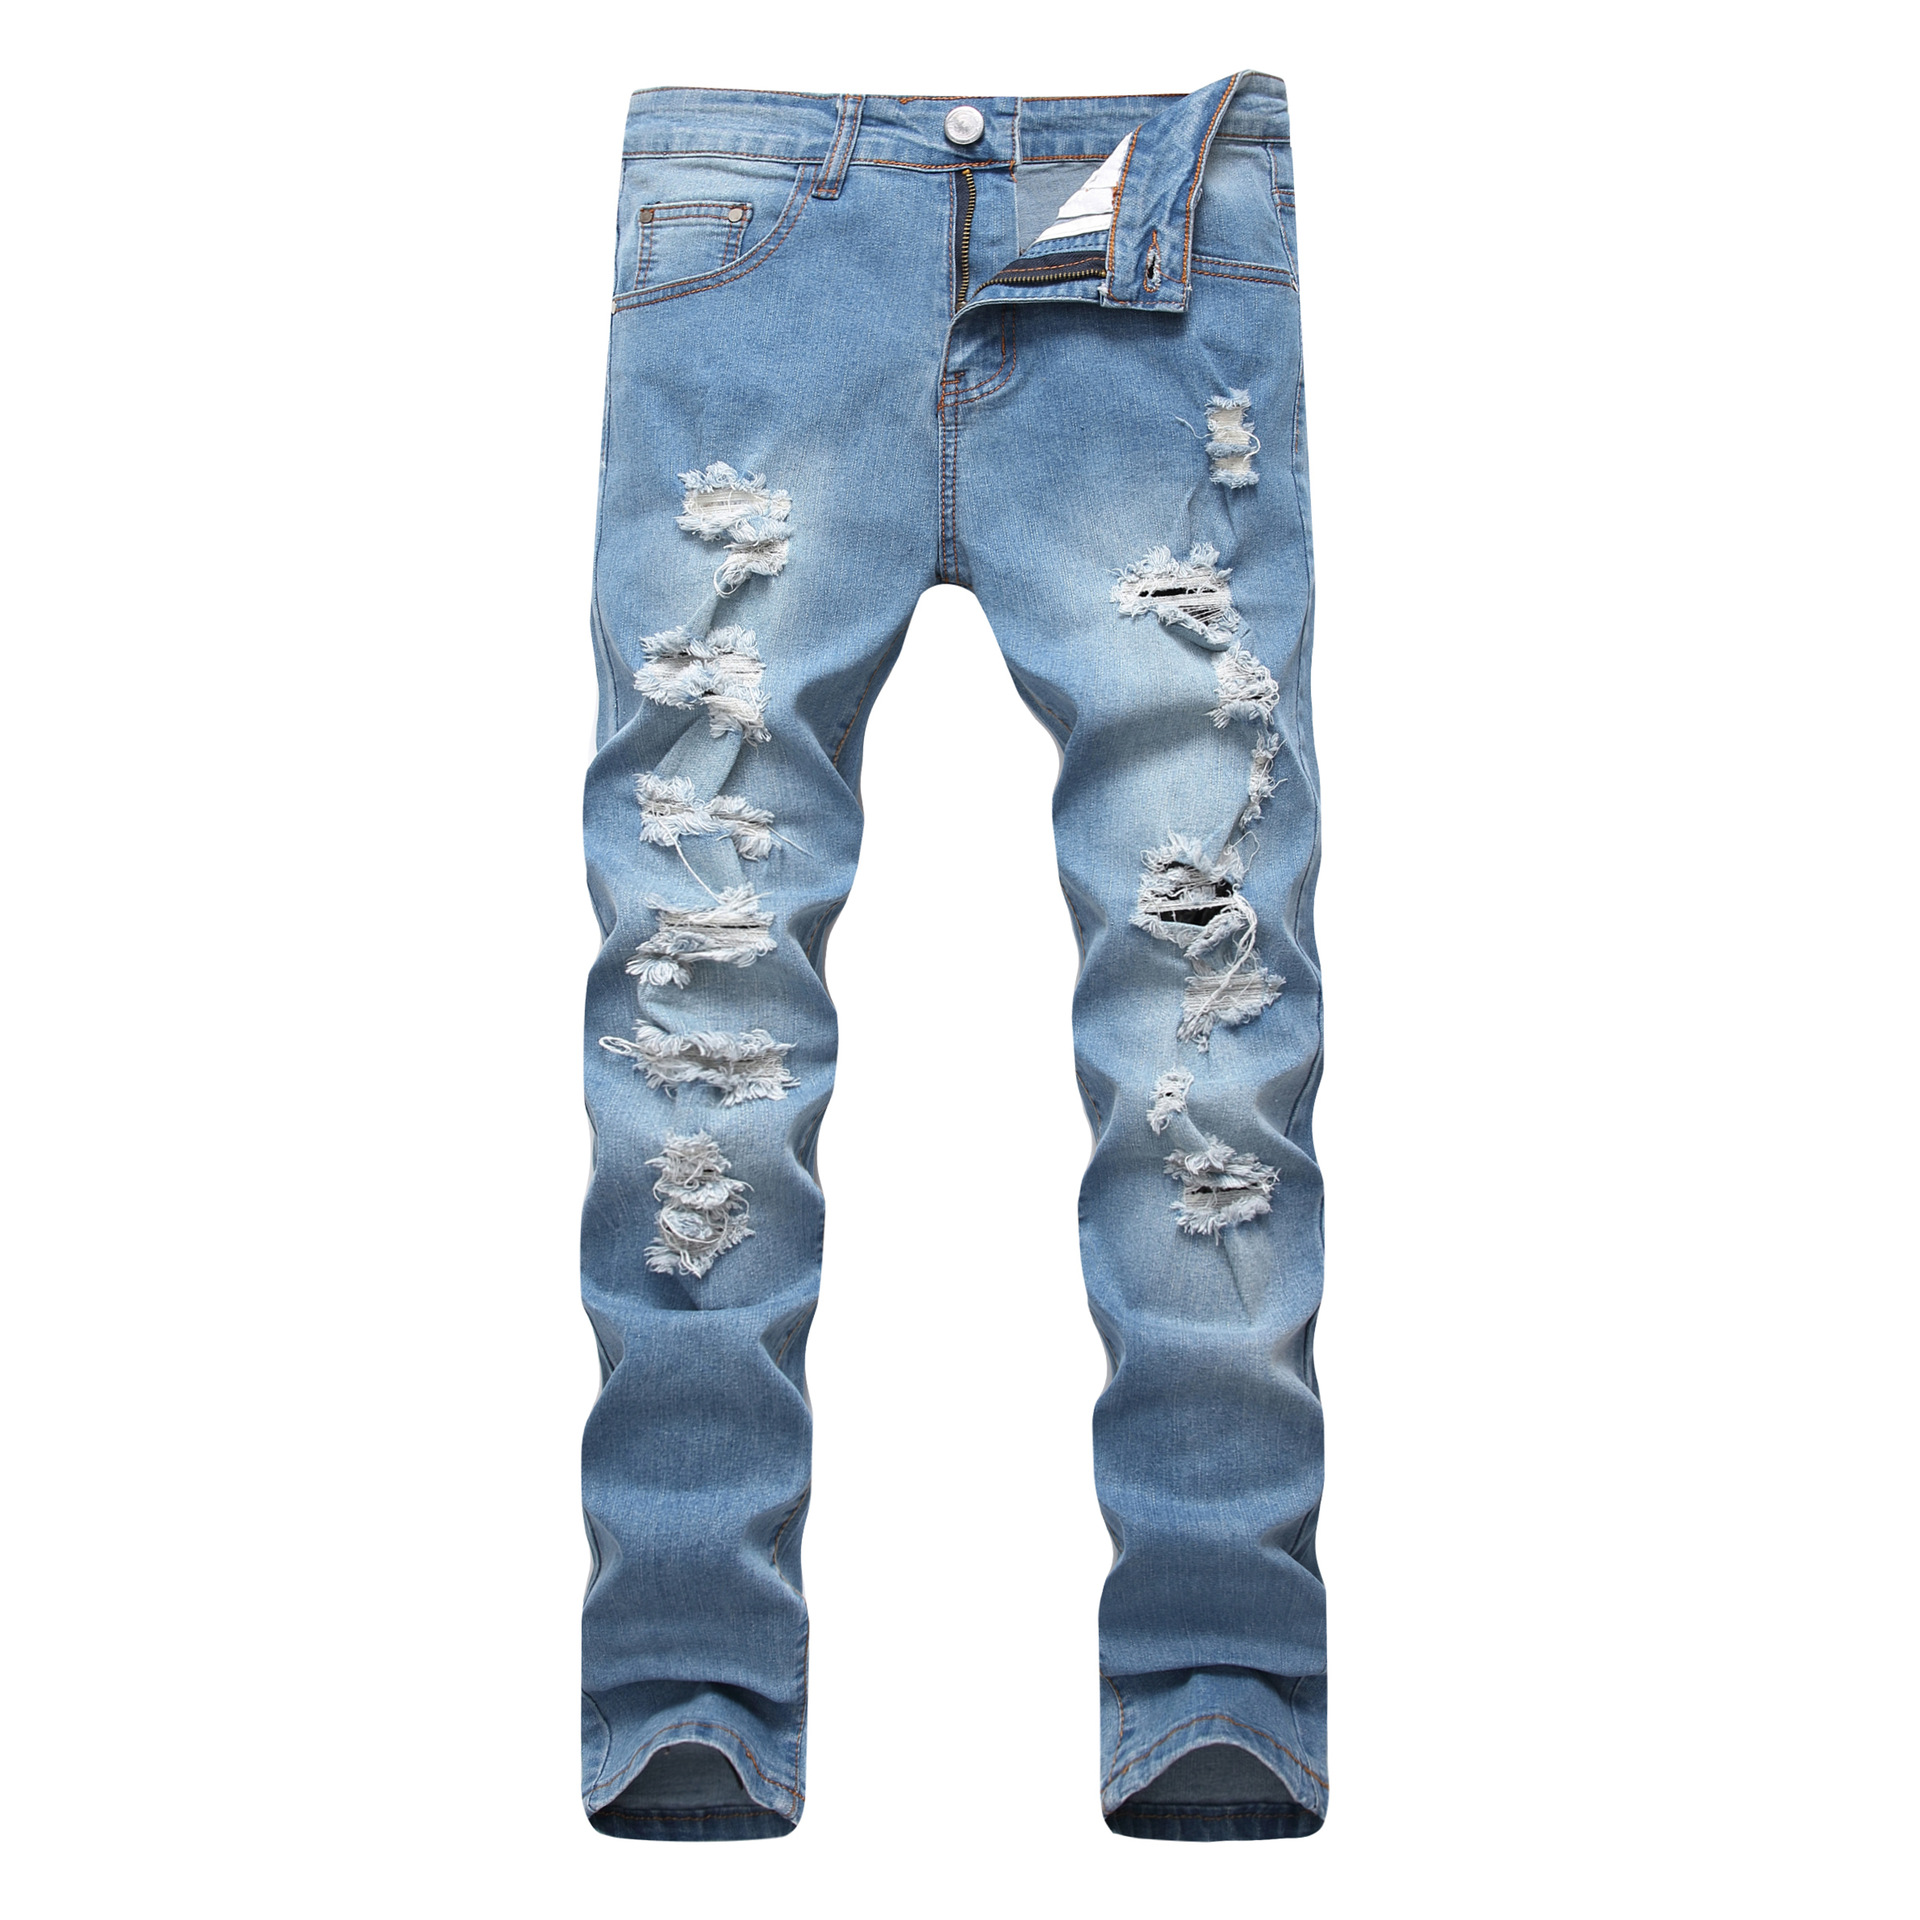 2017 light blue mens holes, stretch jeans, skinny jeans